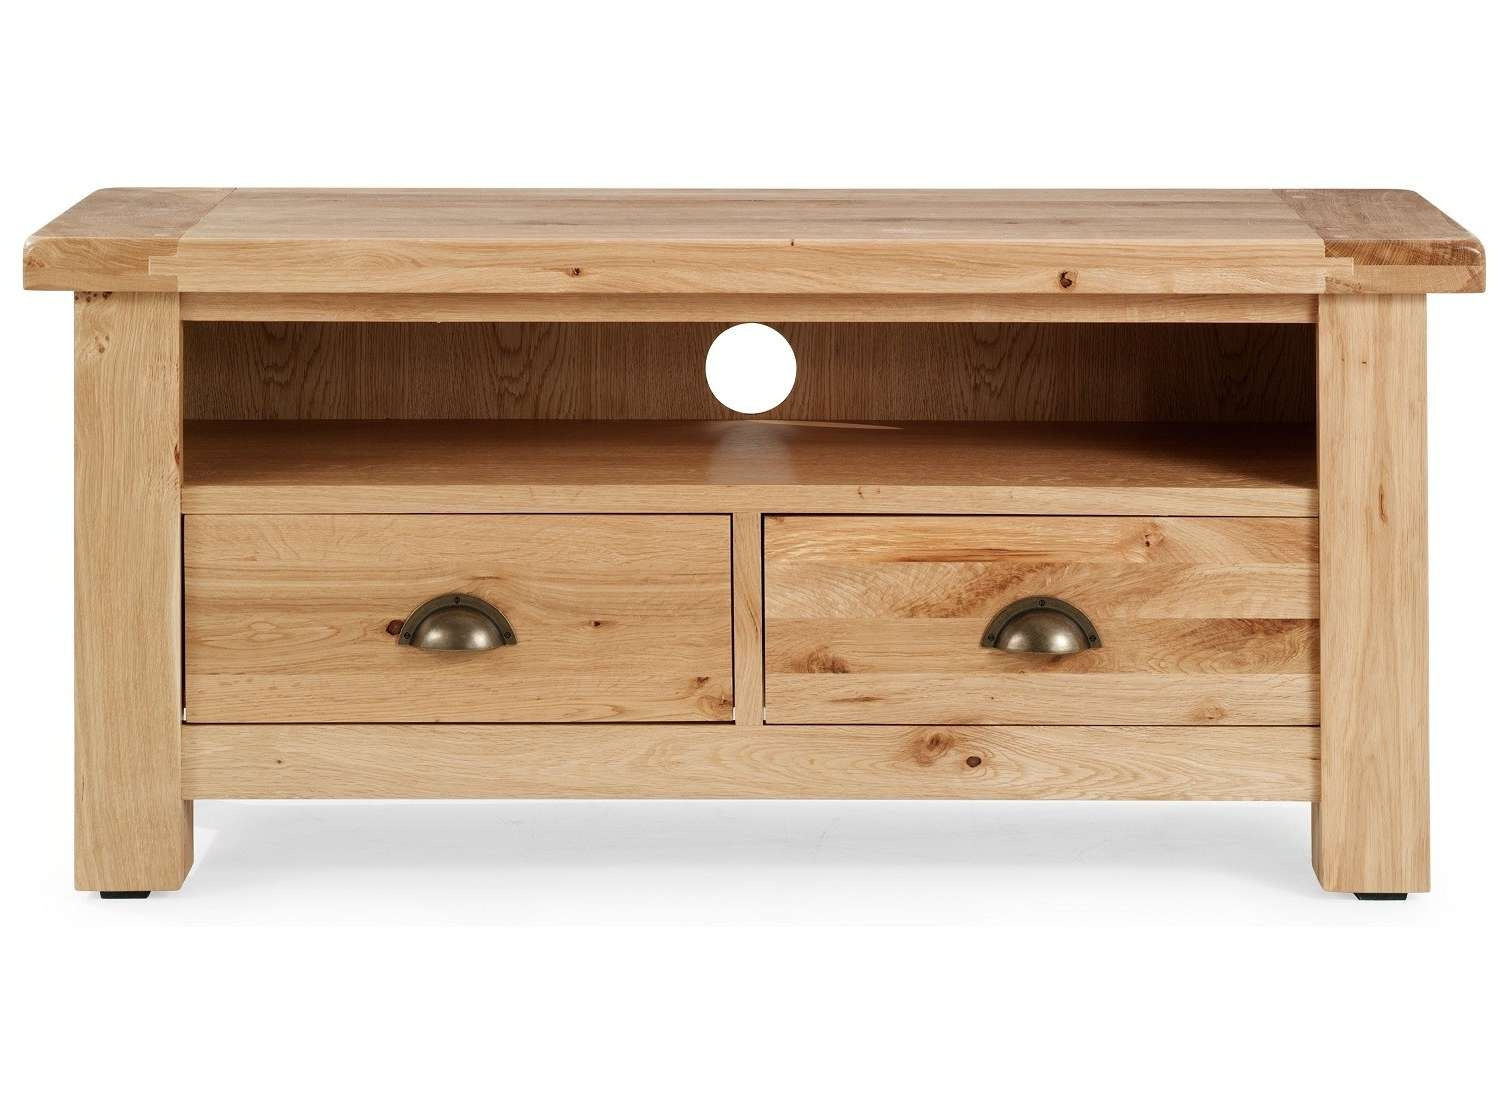 Normandy Rustic French Oak Tv Cabinet | Oak Furniture Uk Within Light Oak Corner Tv Cabinets (View 14 of 20)